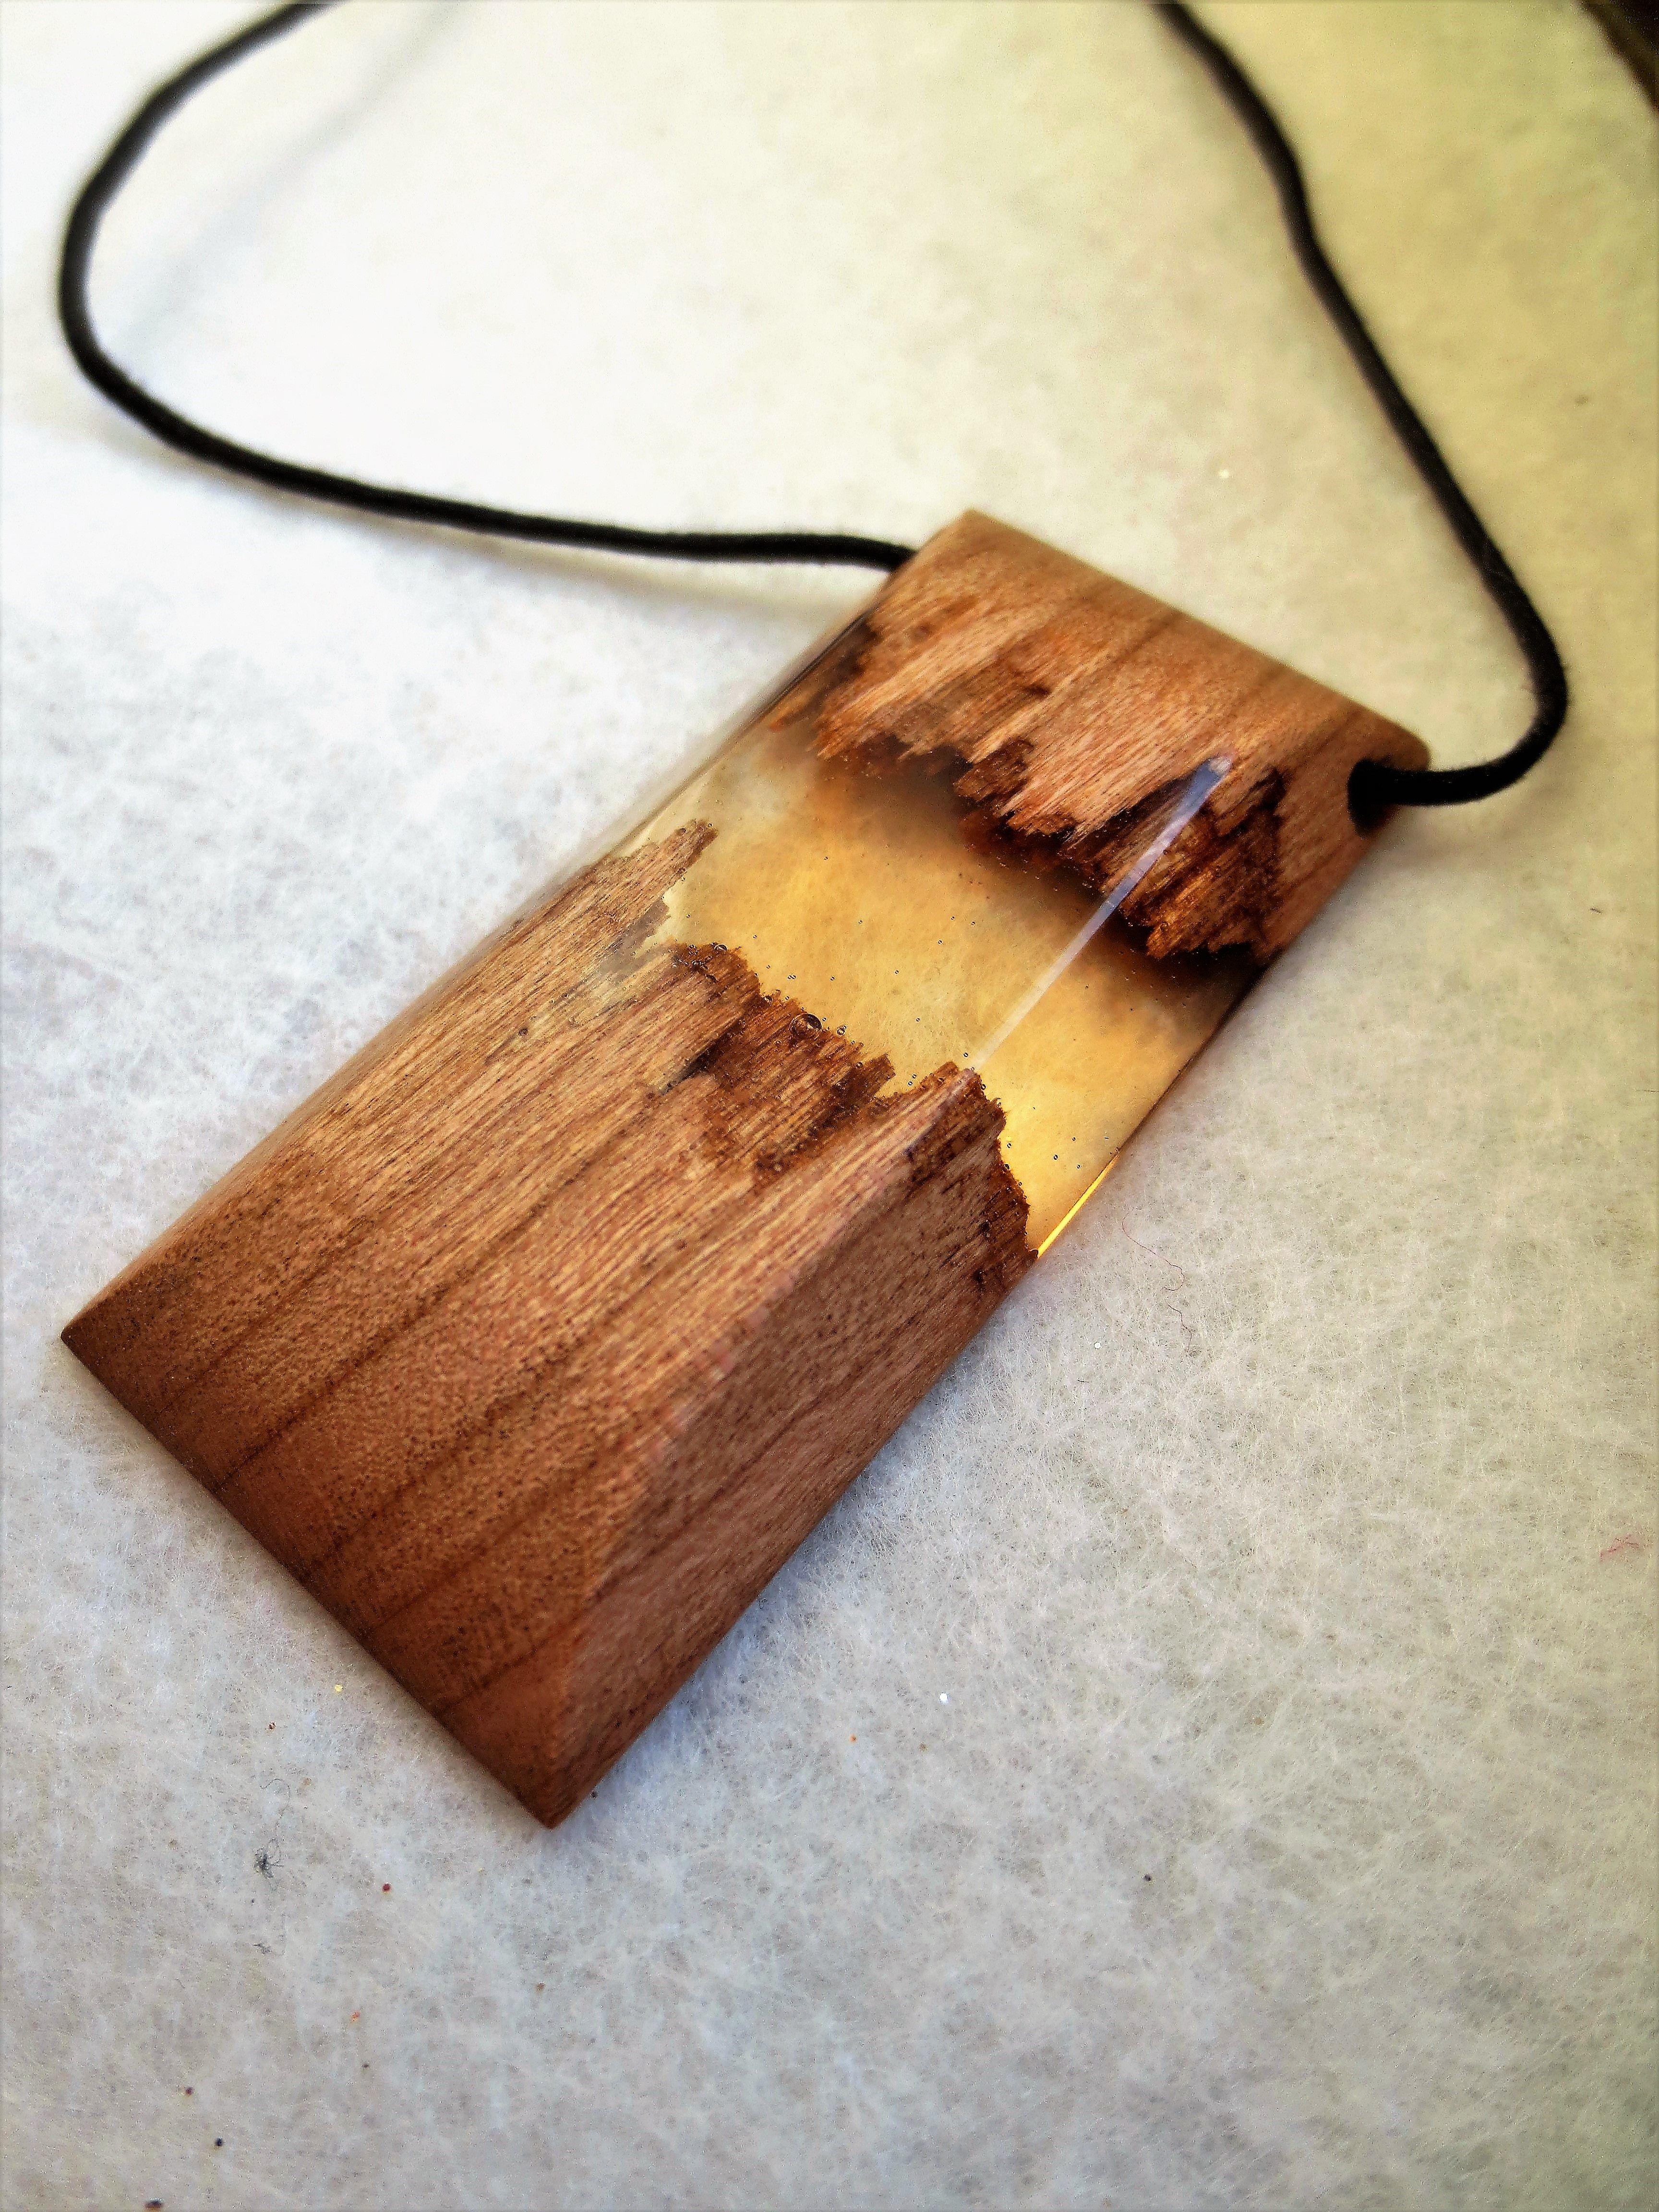 Handmade wooden pendant handmade wooden jewellery rono narejen handmade wooden pendant aloadofball Gallery